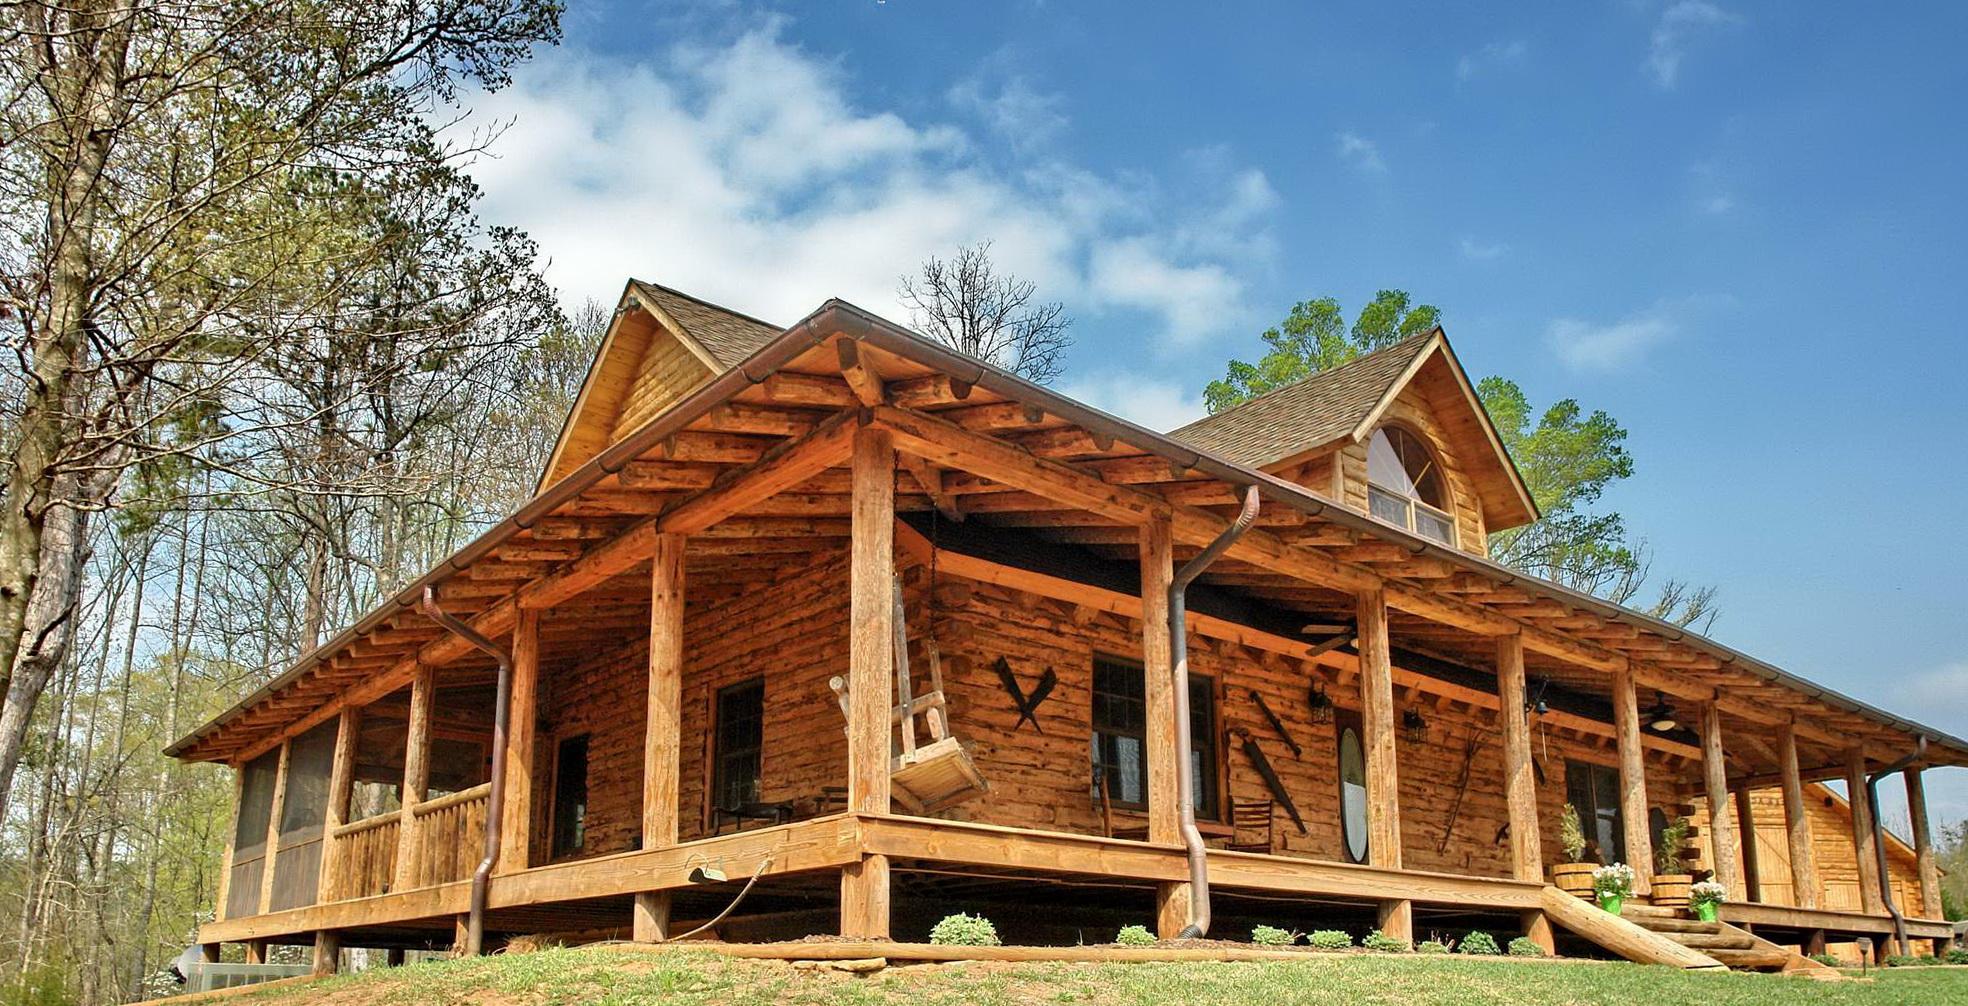 Old Farmhouse Plans With Wrap Around Porches | Home Design Ideas